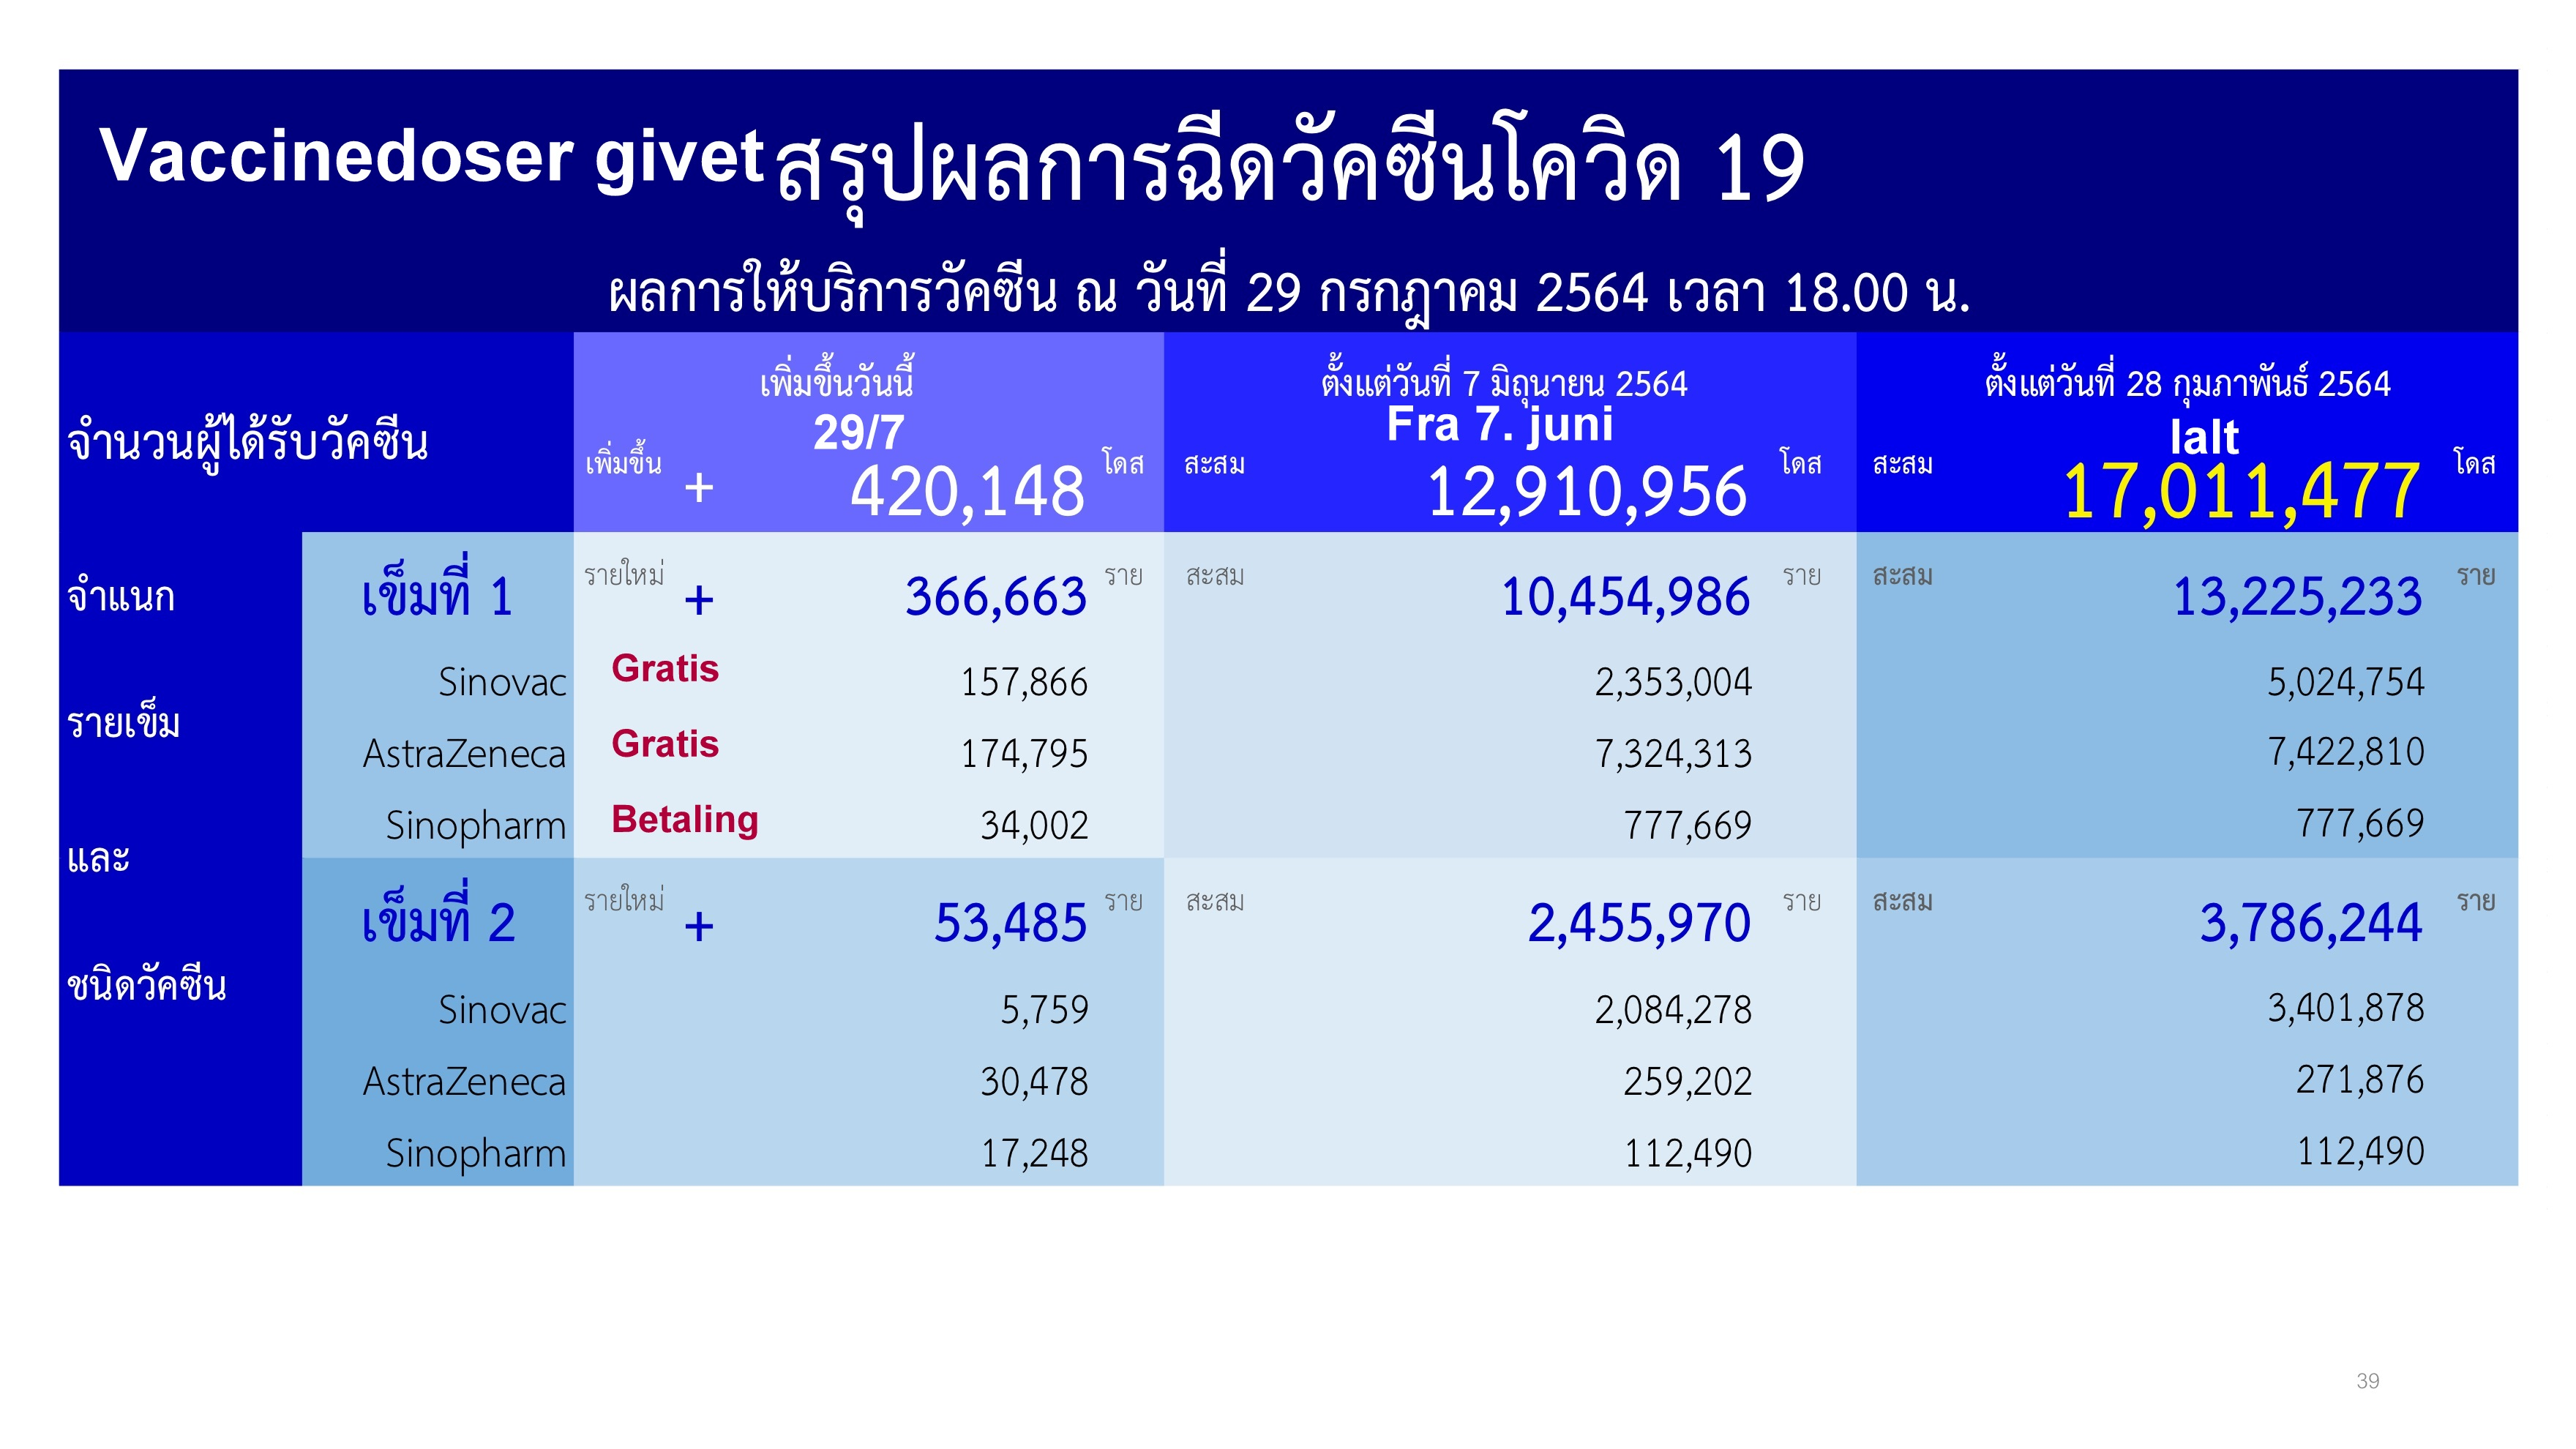 www.thaiguide.dk/images/forum/covid19/vaccine%20doser%20givet%2029-07-21%20r.jpg